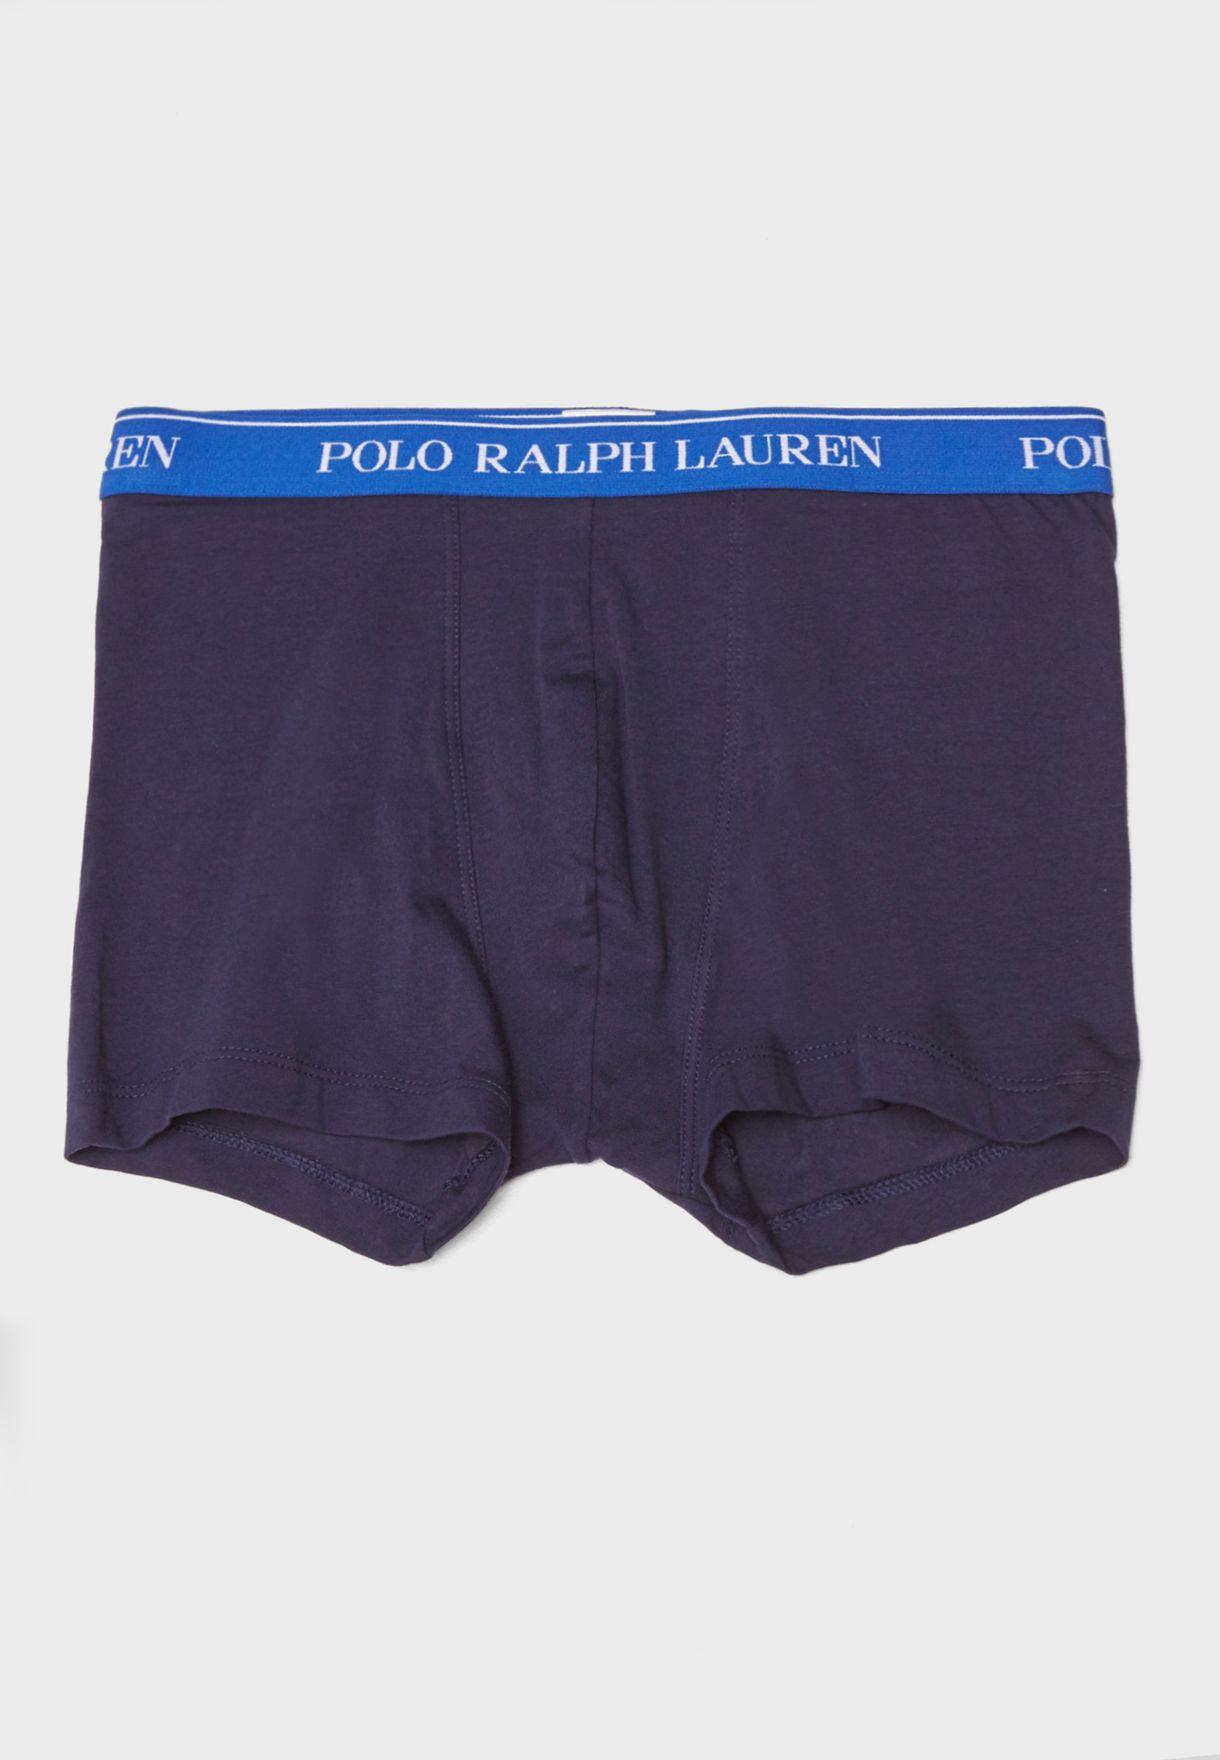 c61136aba0a440 Polo Ralph Lauren Herren Shorts 714662050007